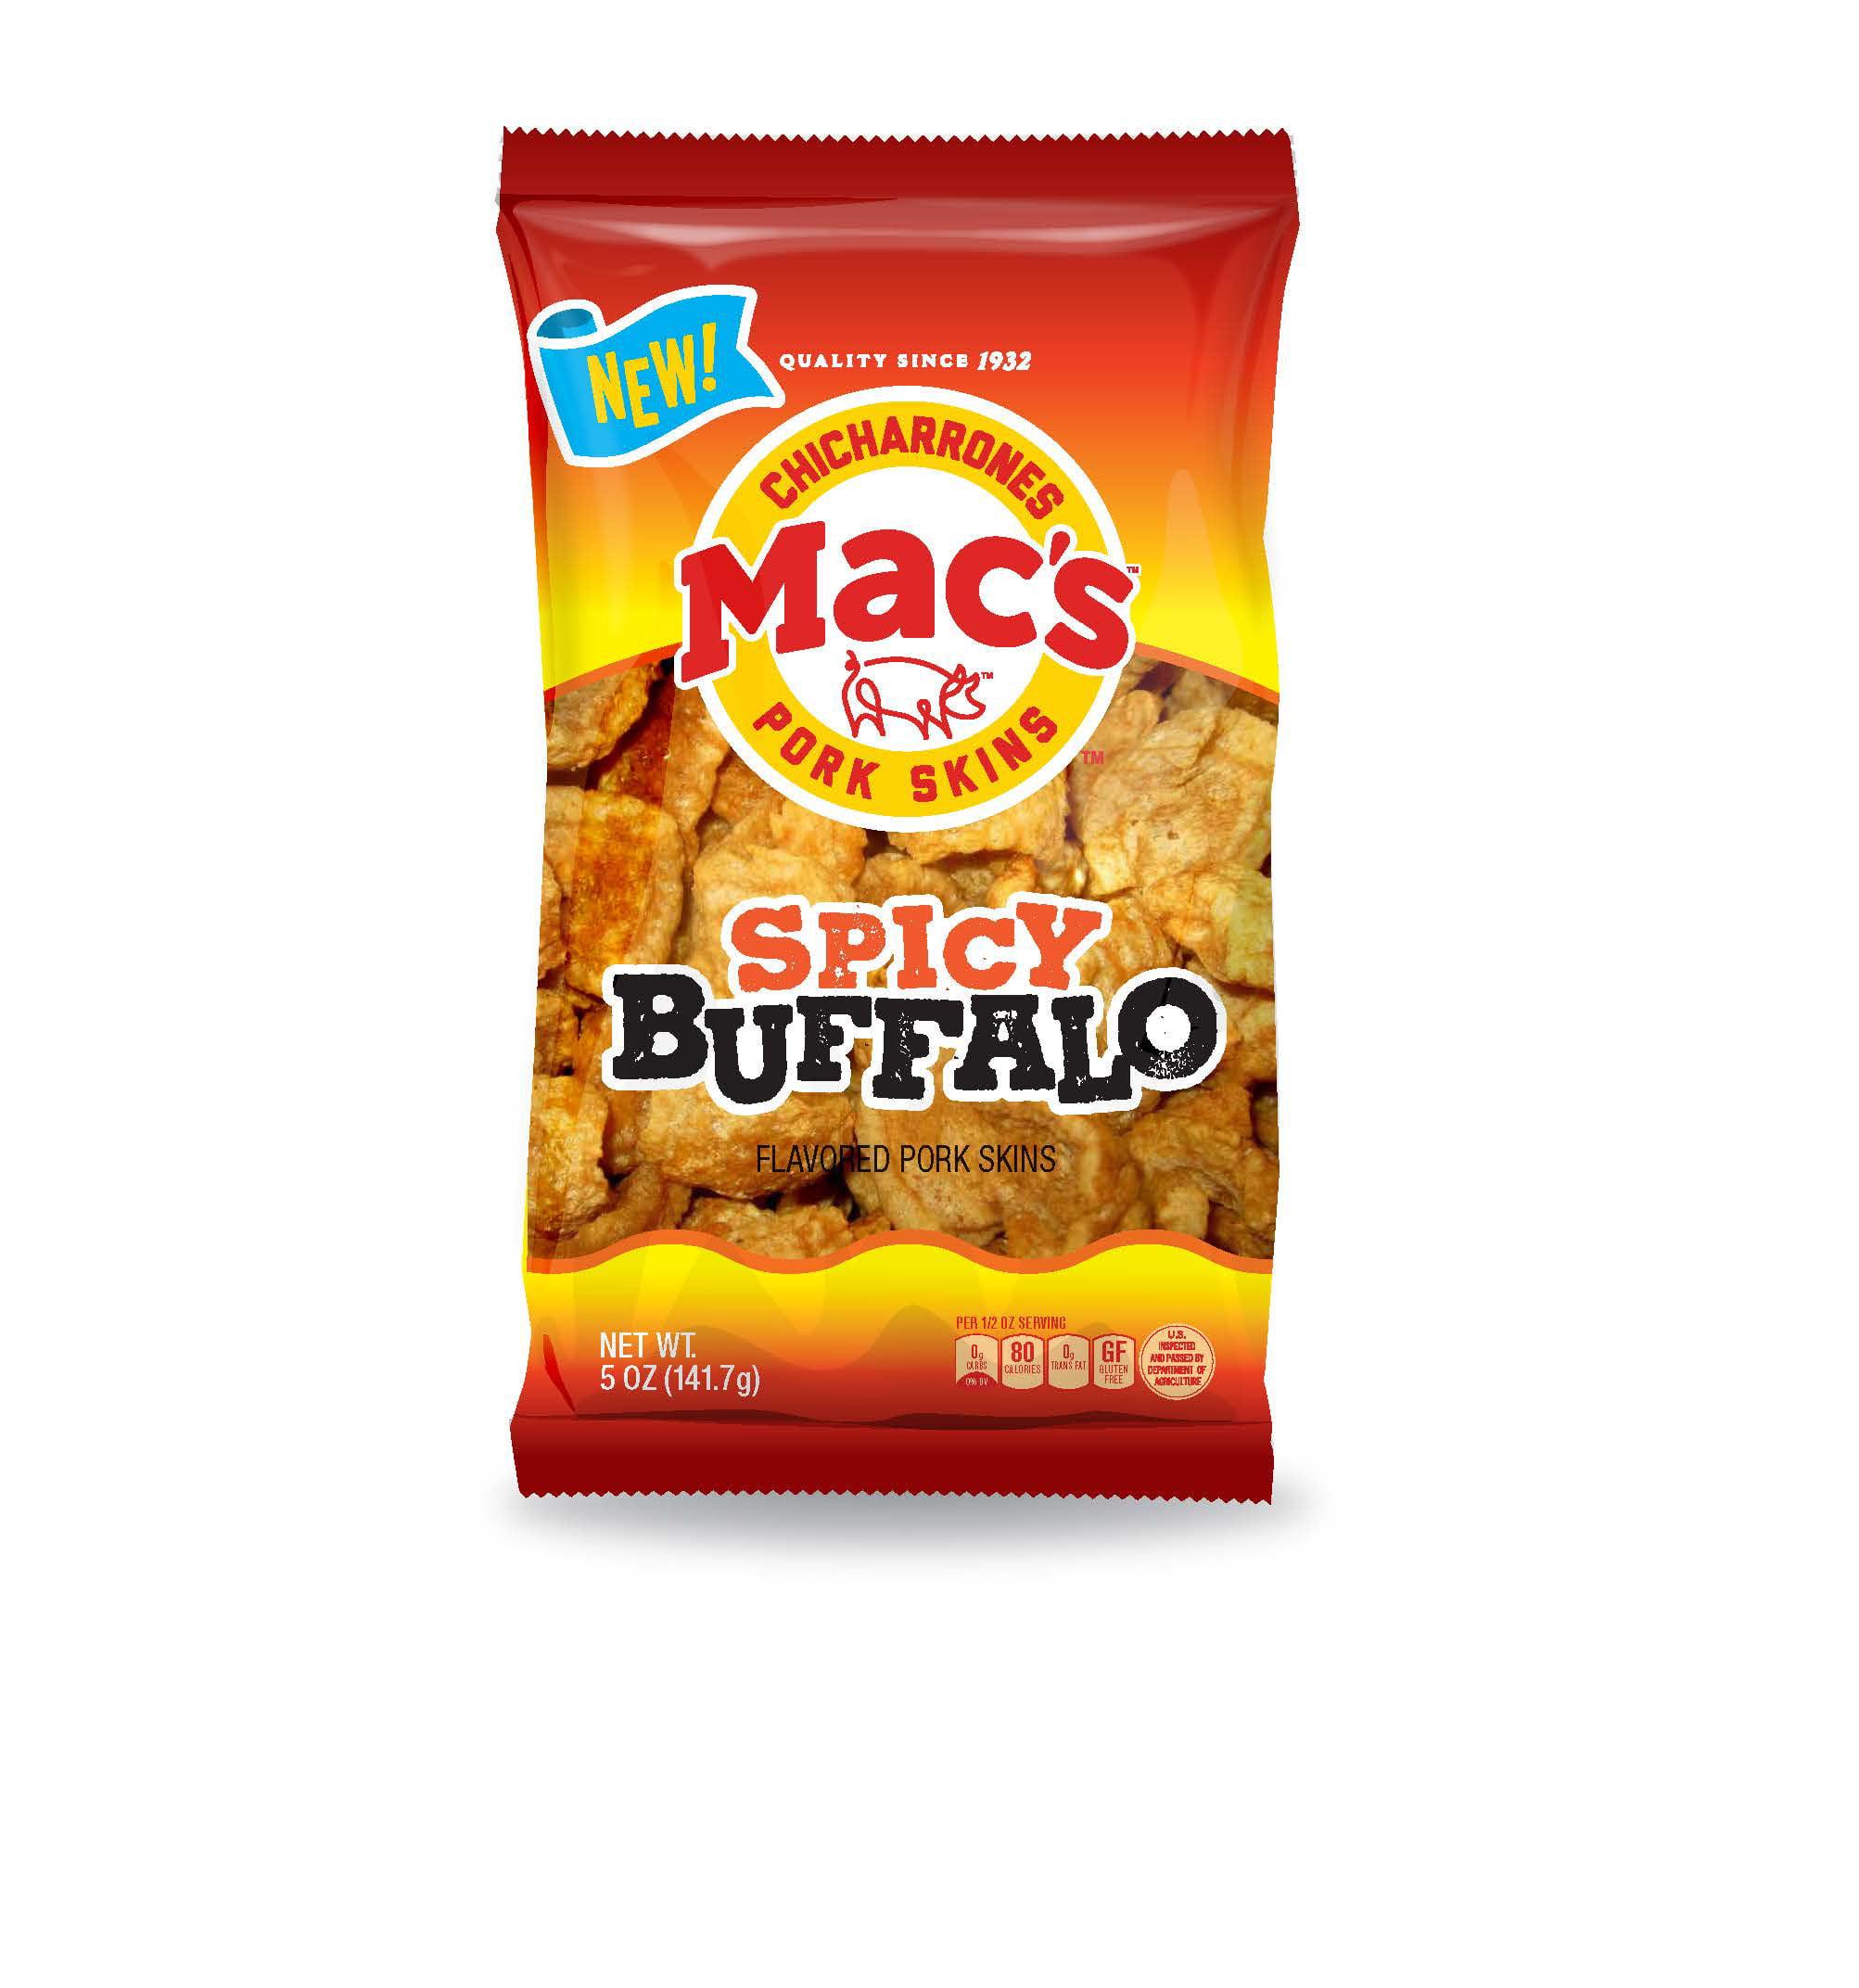 Mac's Spicy Buffalo Flavored Pork Skin, 5 Oz.